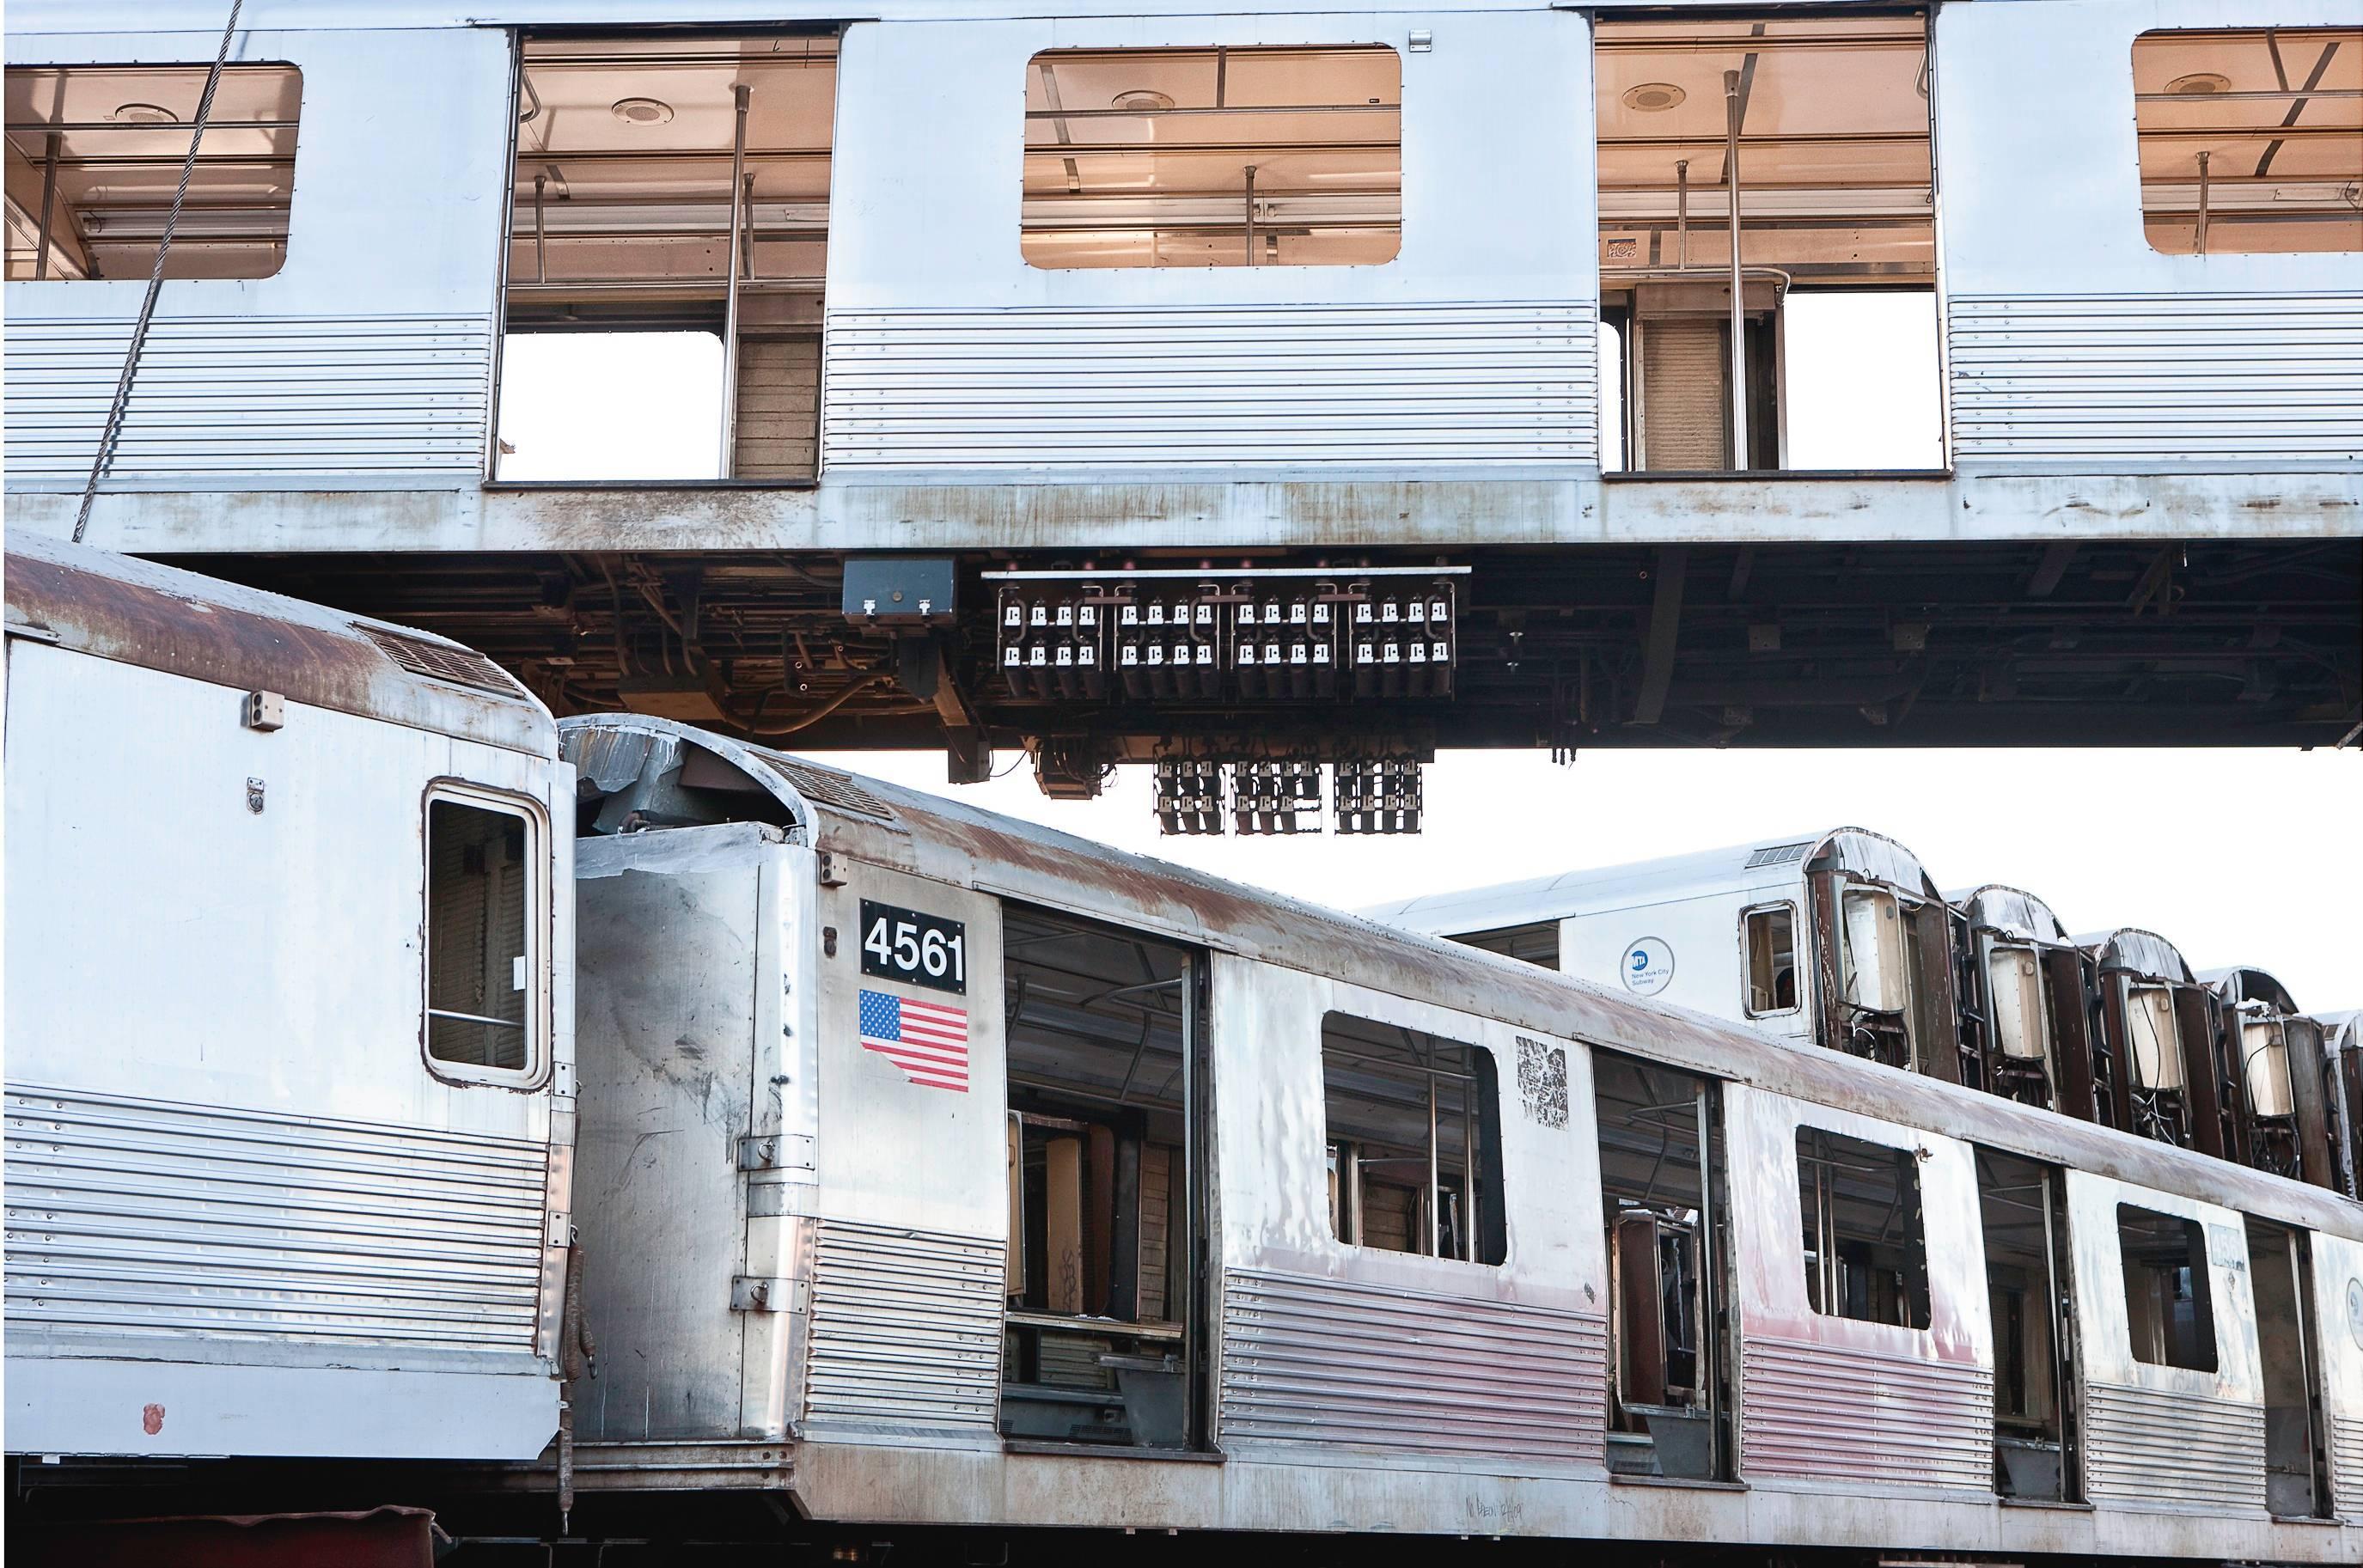 "Commute 30""x45"" photograph (New York Subway Cars)"